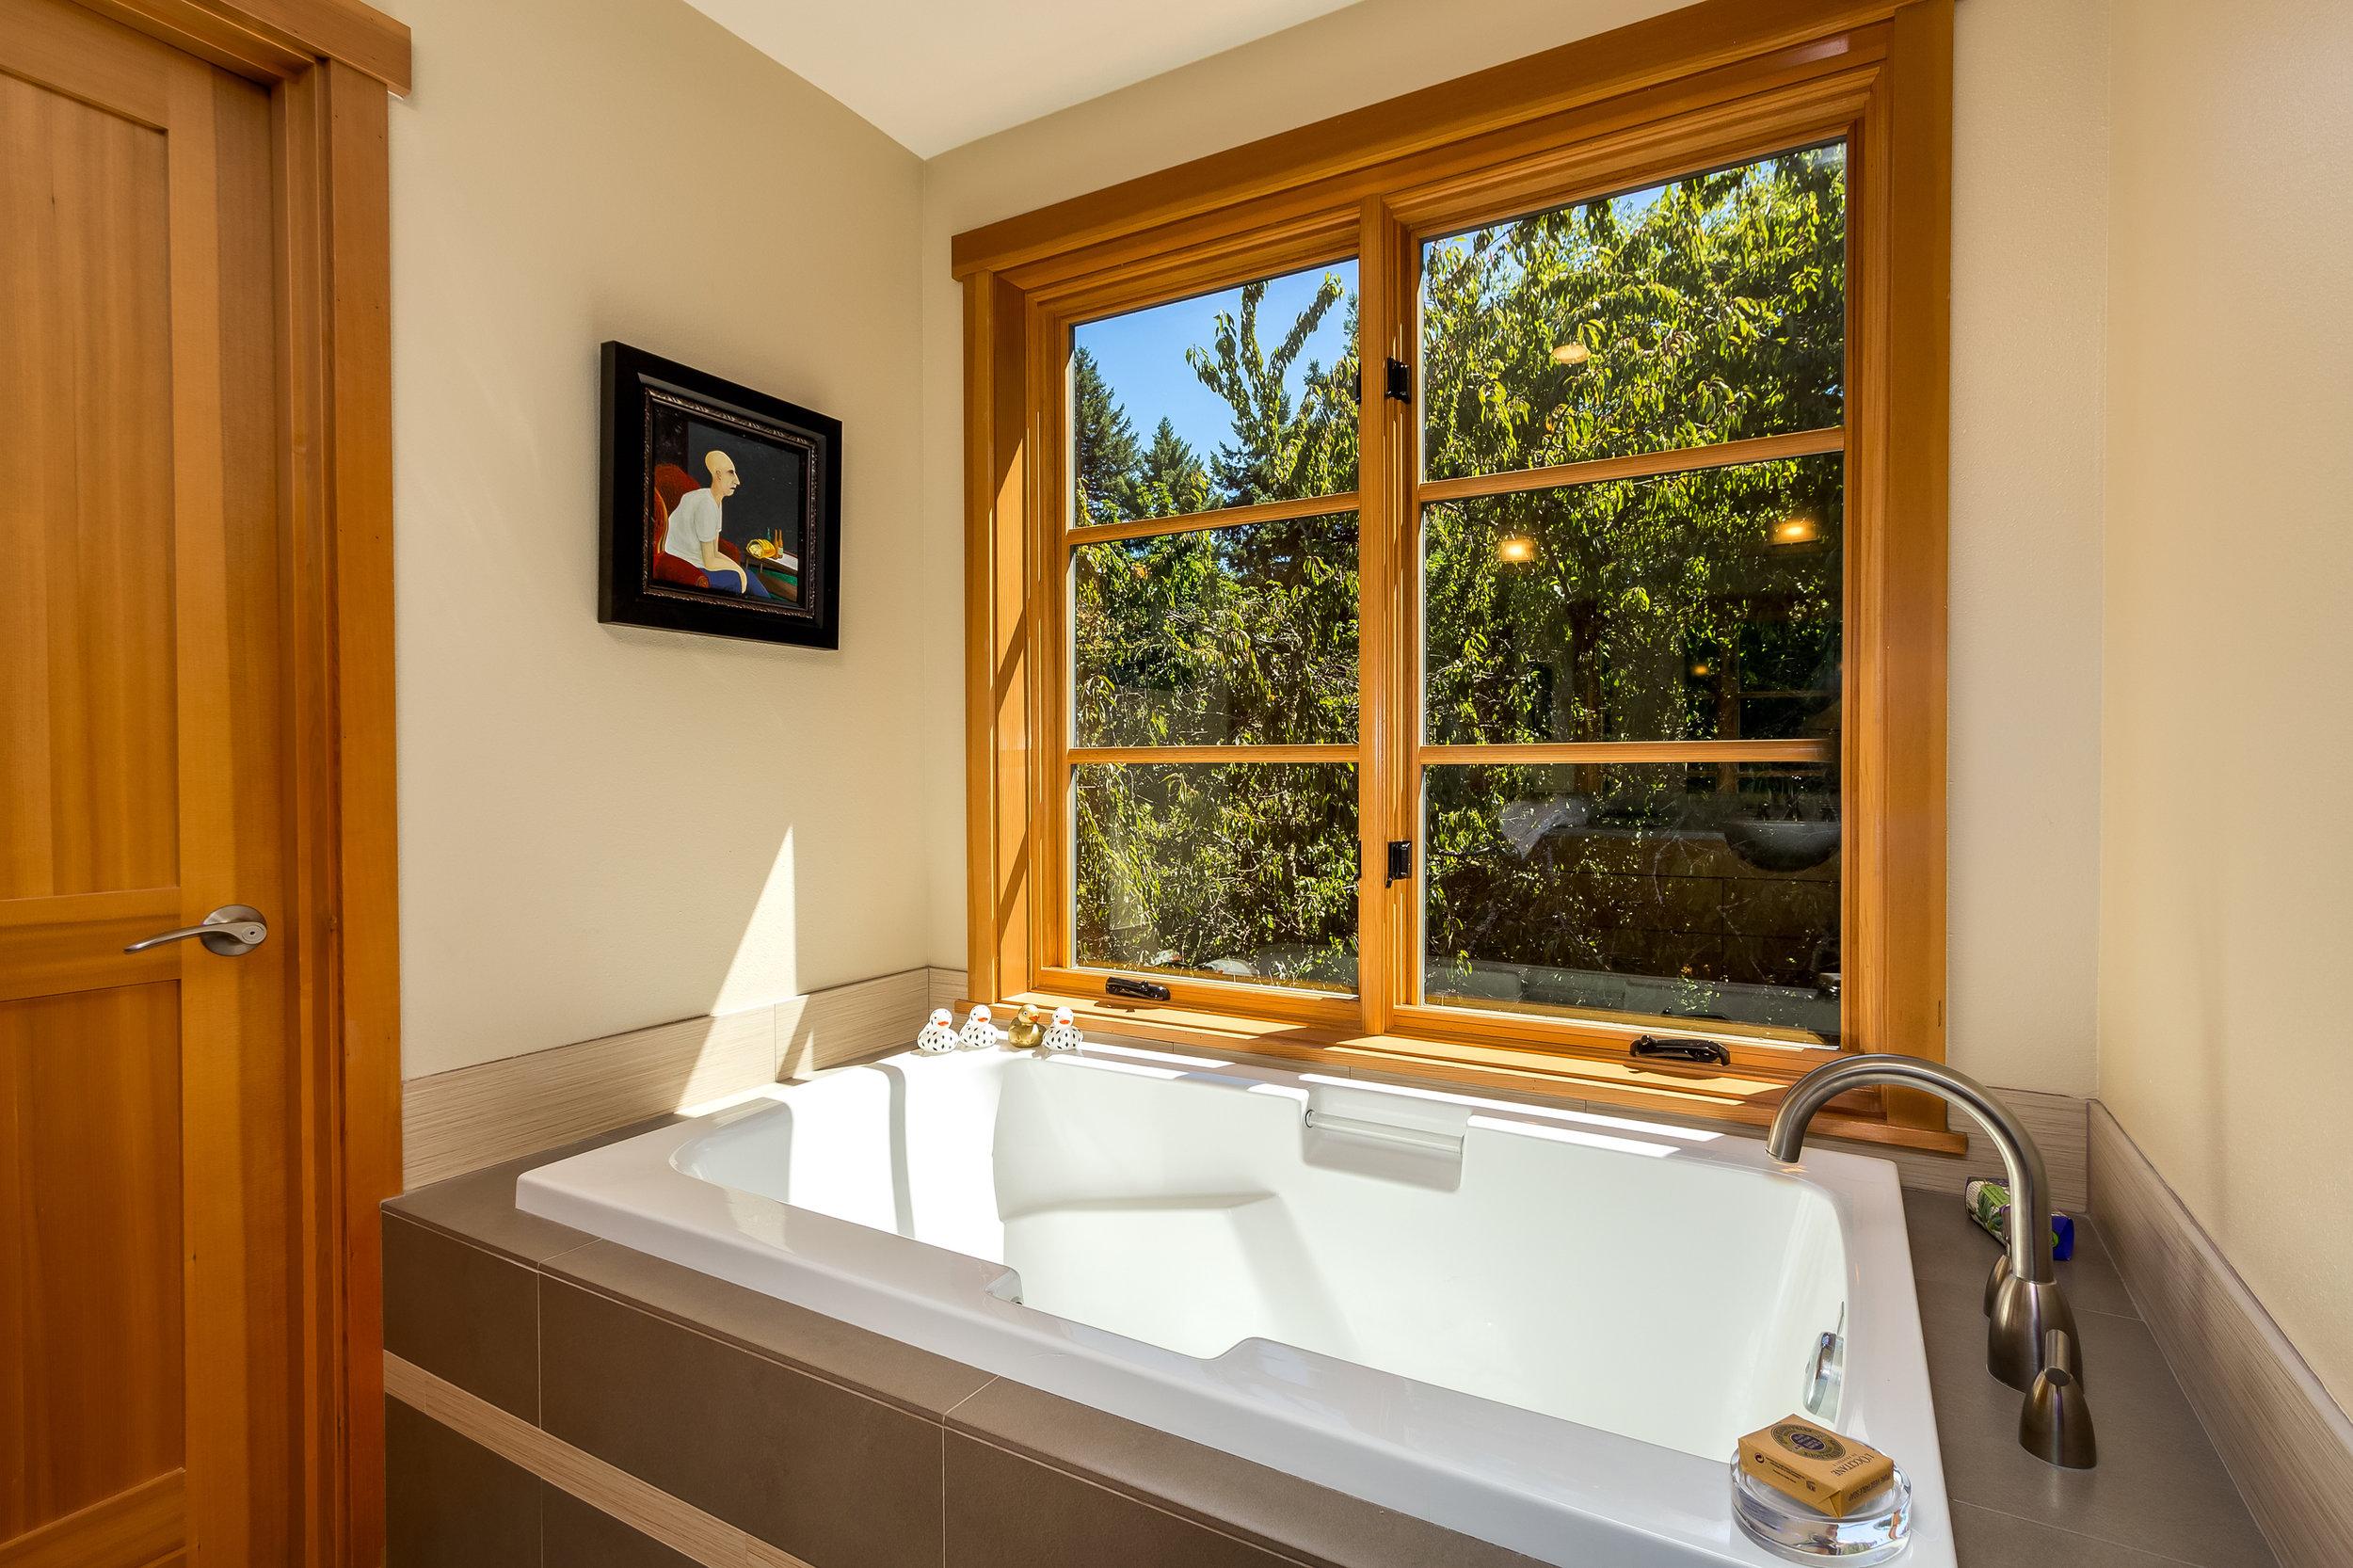 Master Bath soaking tub overlooks the lush landscaping.